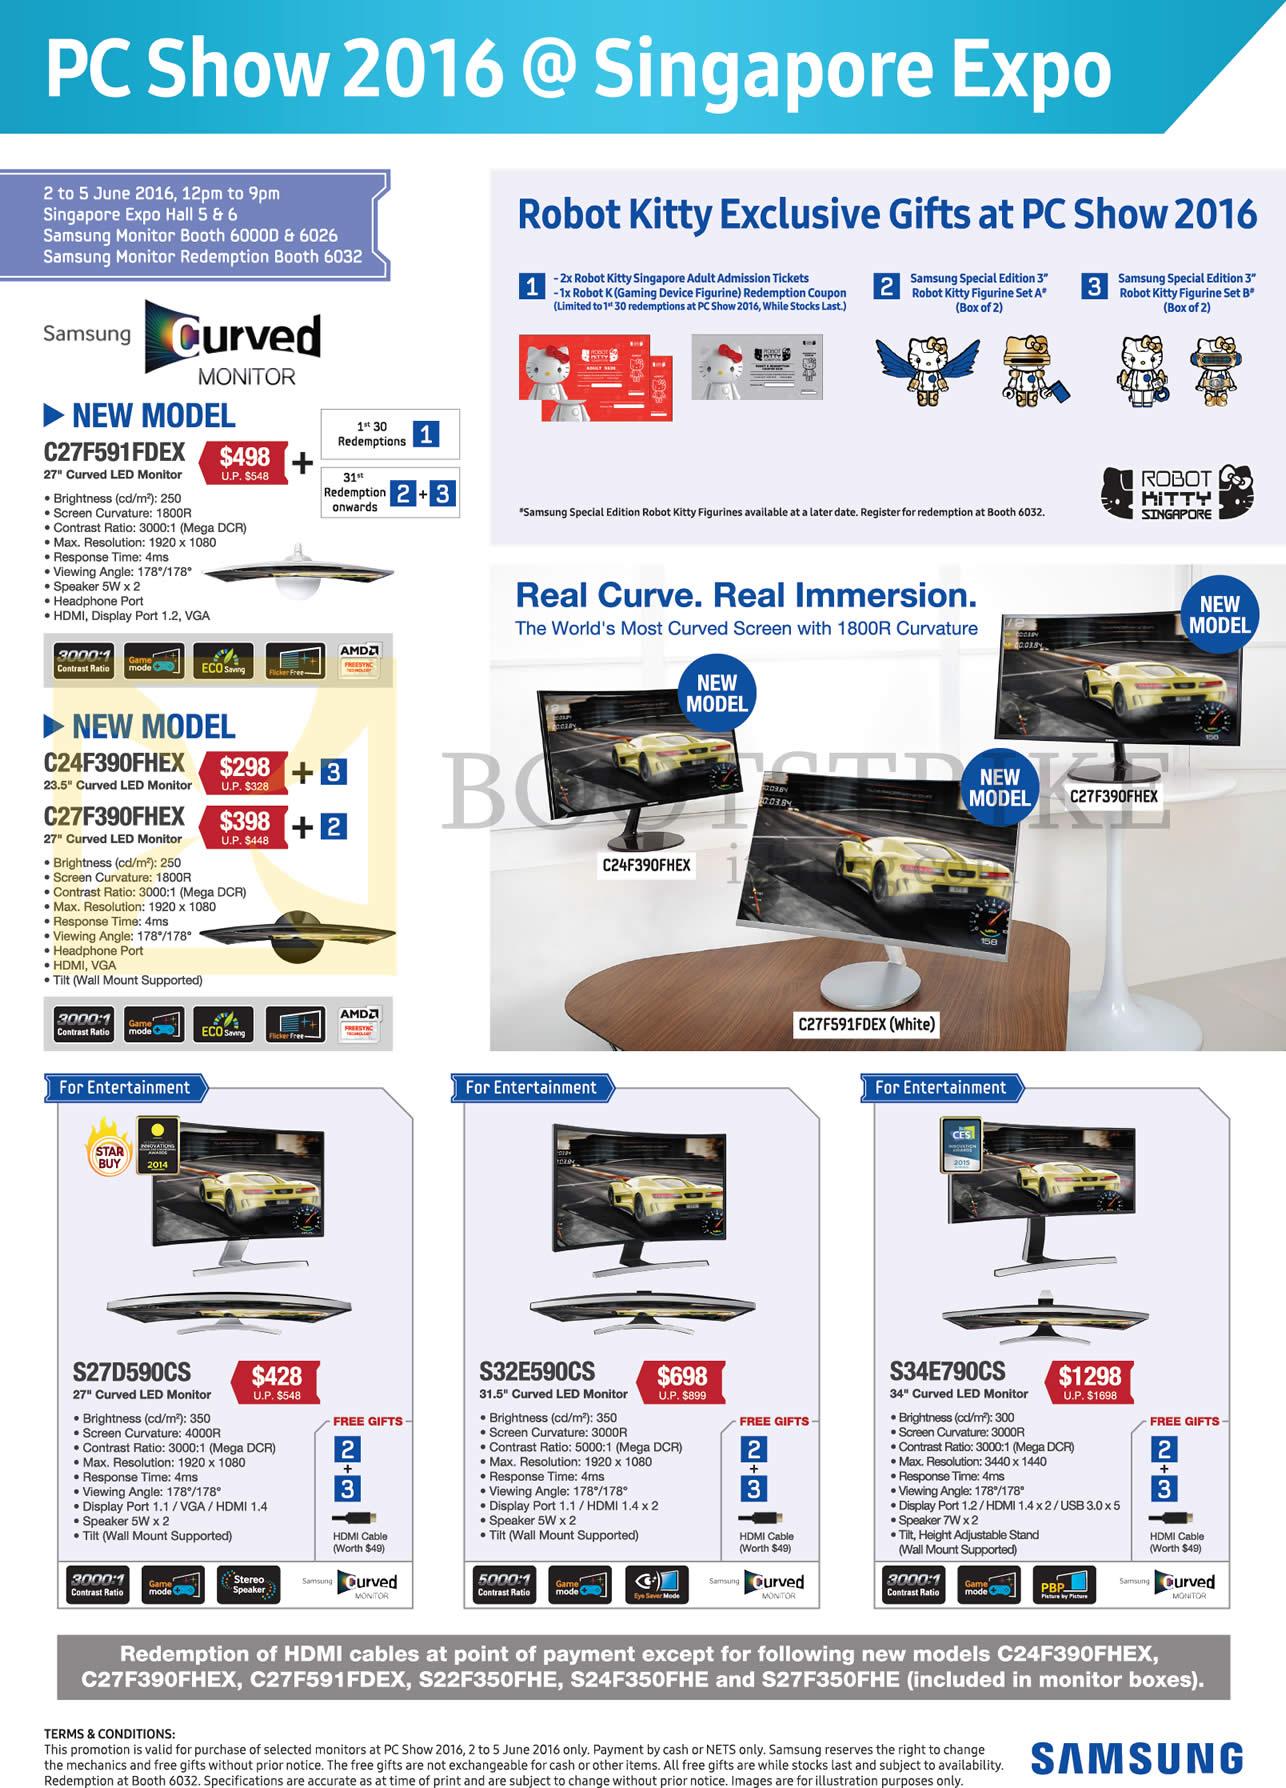 PC SHOW 2016 price list image brochure of Samsung Monitors, Hello Robot Kitty Gifts, C27F591FDEX, C24F390FHEX, C27F390FHEX, S27D590CS, S32E590CS, S34E790CS